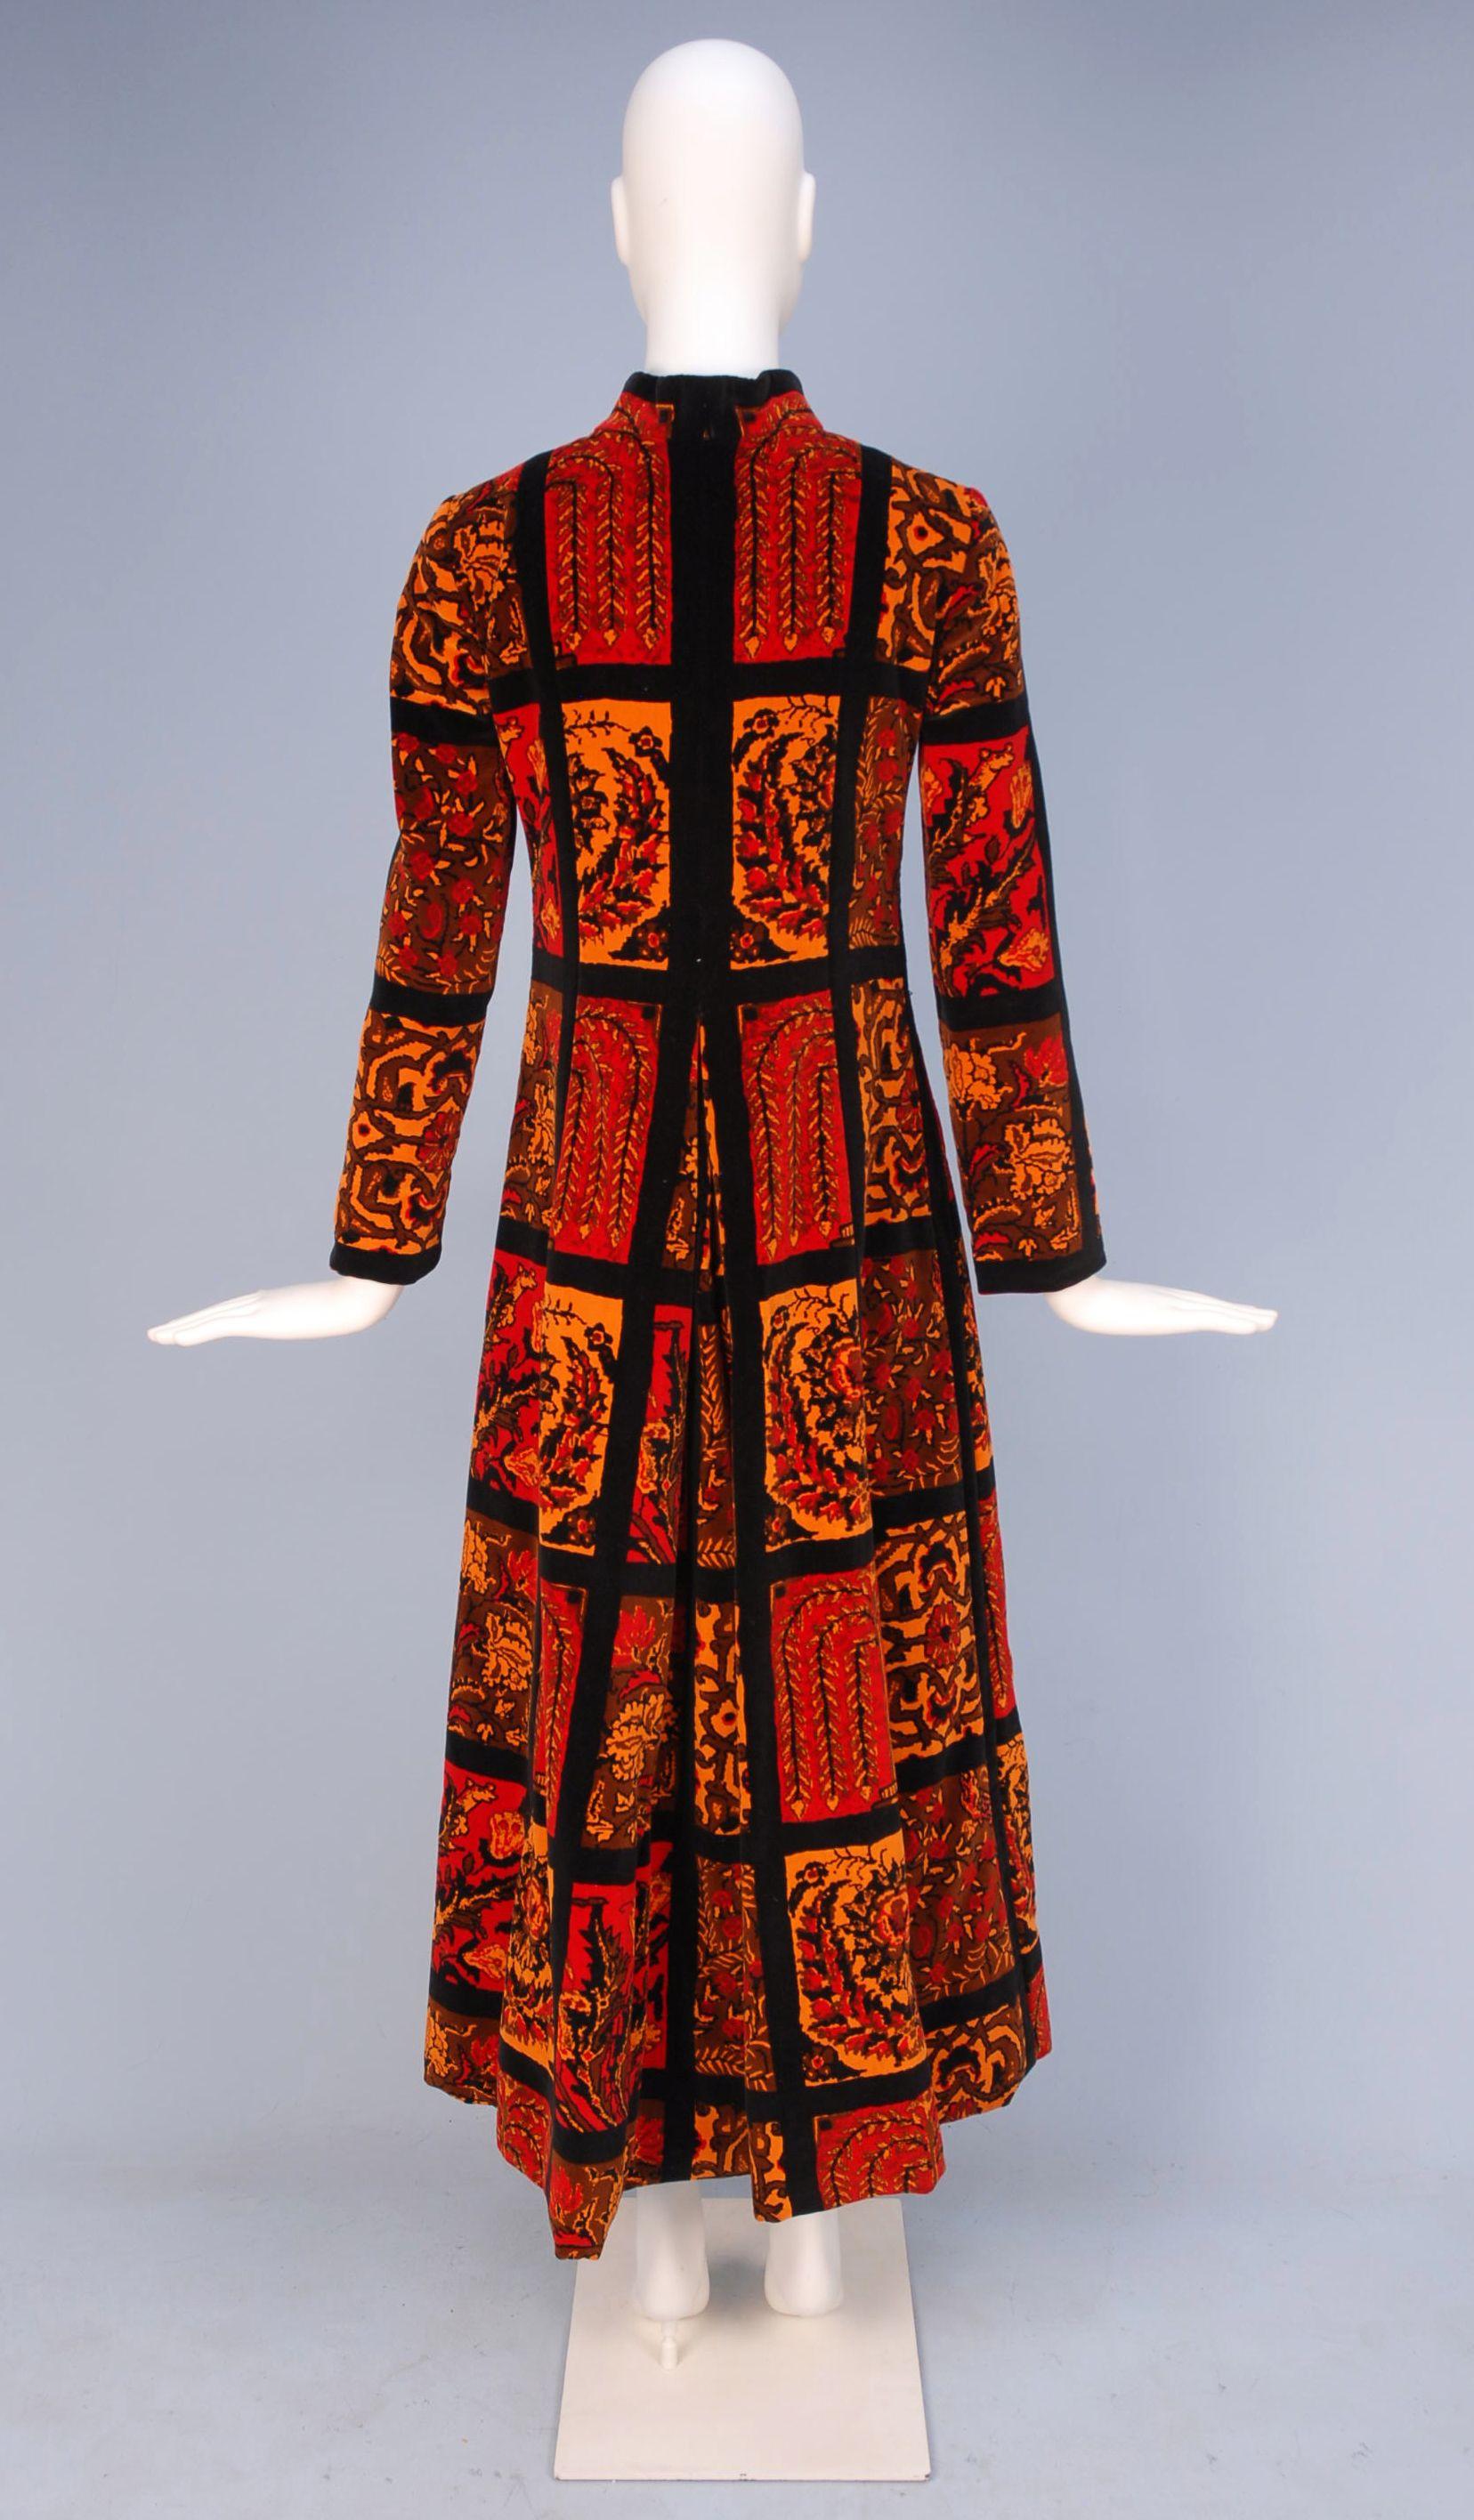 6c9cc294989b LOT 973 - whitakerauction | 1960s | Fashion, Psychedelic pattern ...